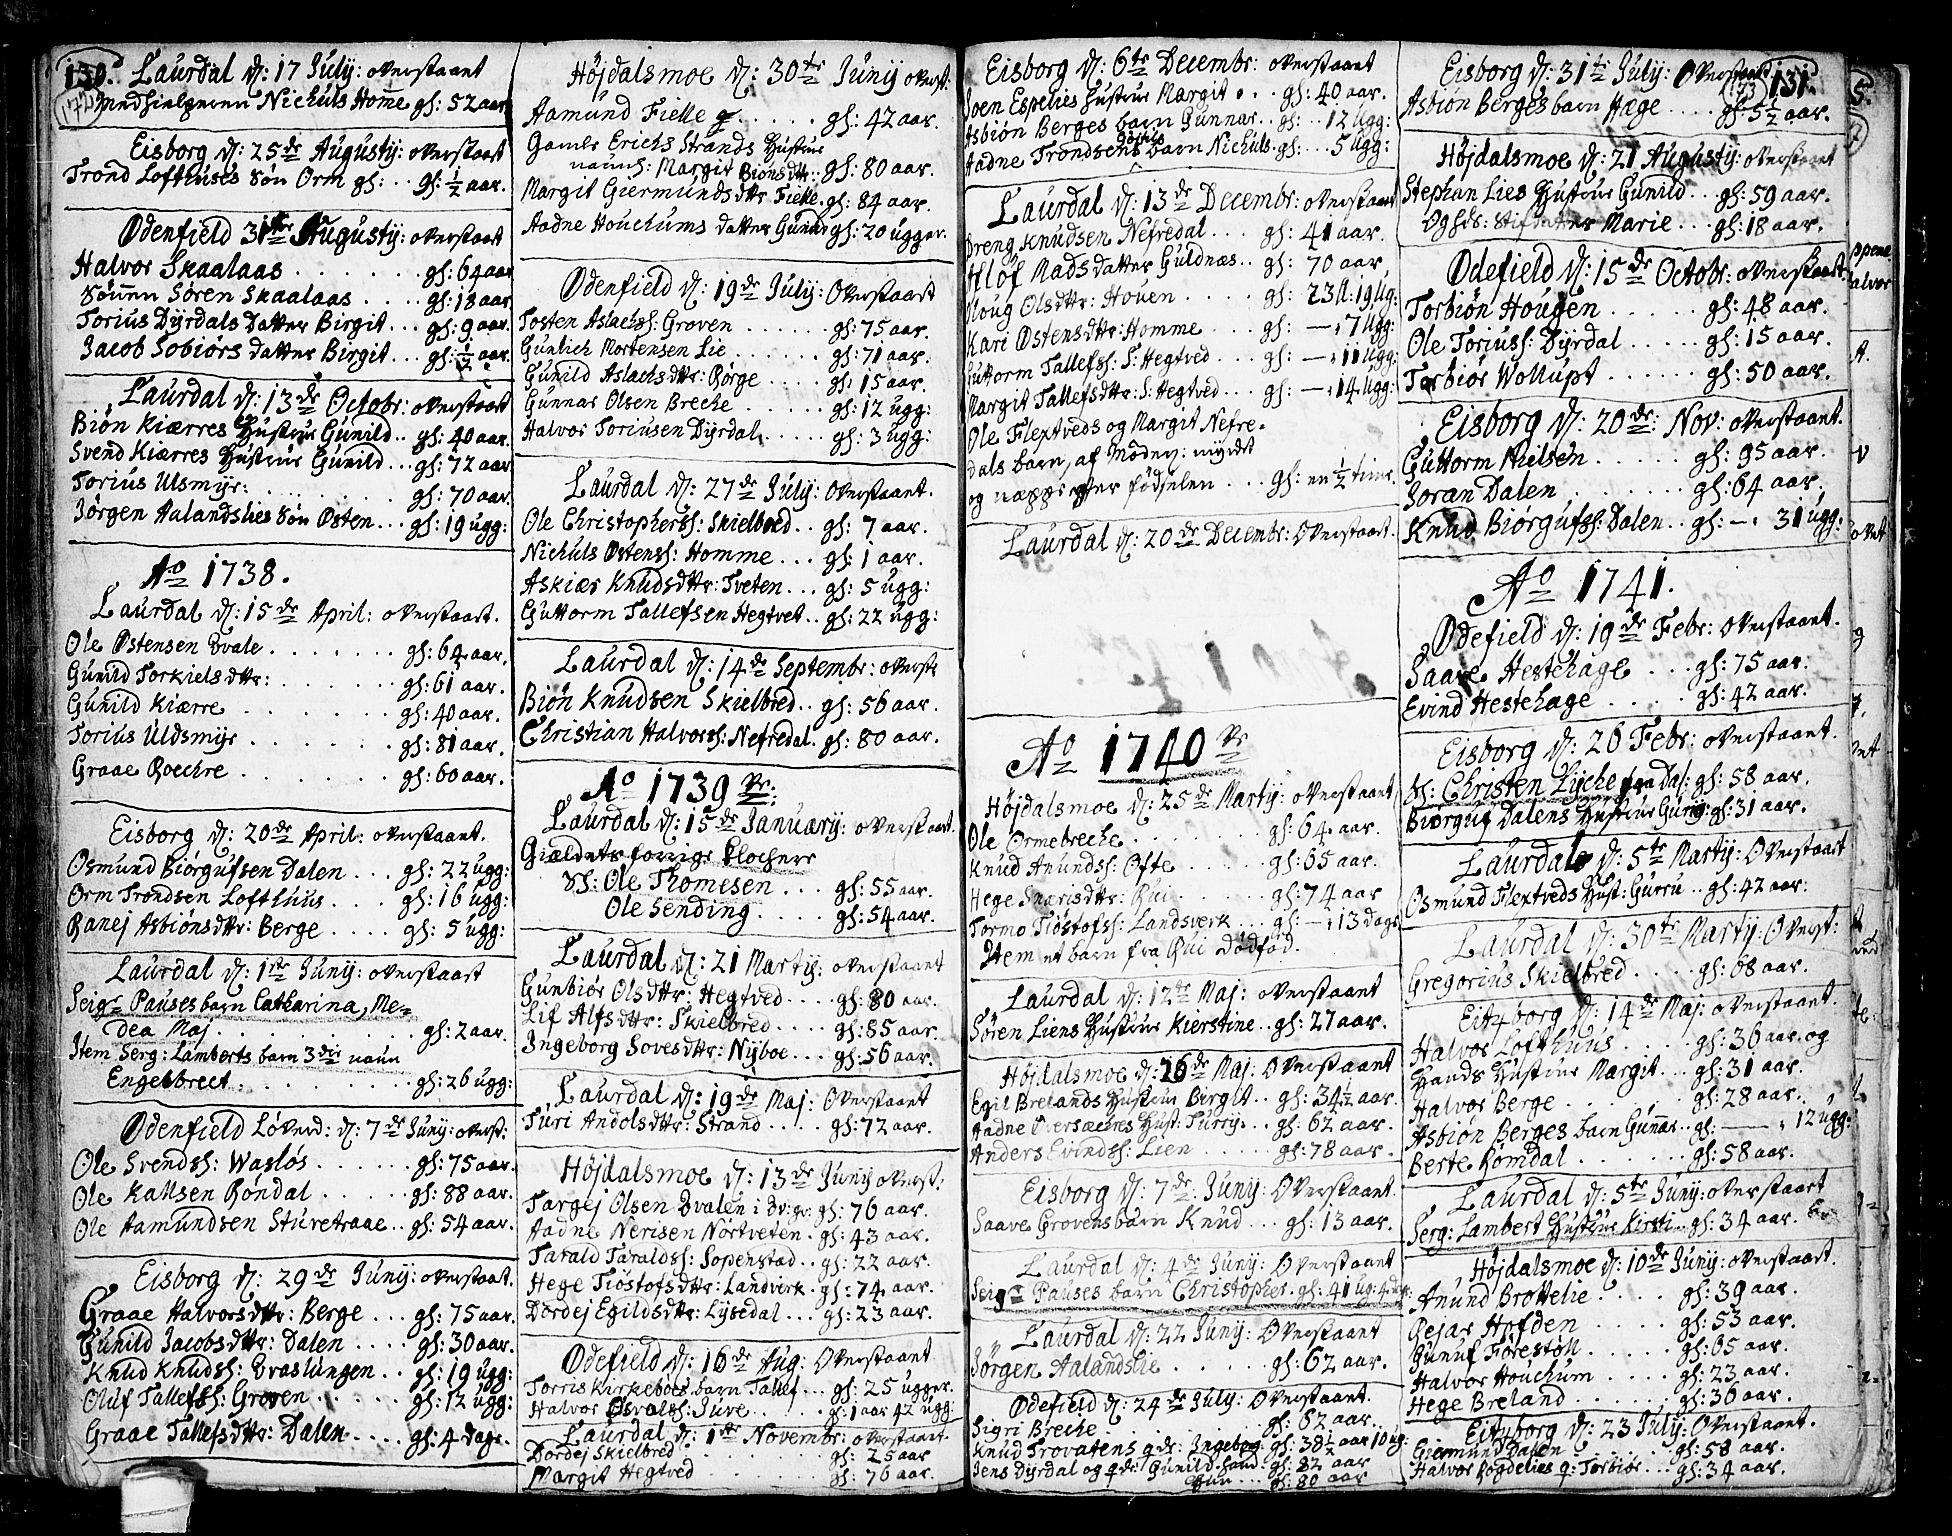 SAKO, Lårdal kirkebøker, F/Fa/L0002: Parish register (official) no. I 2, 1734-1754, p. 172-173